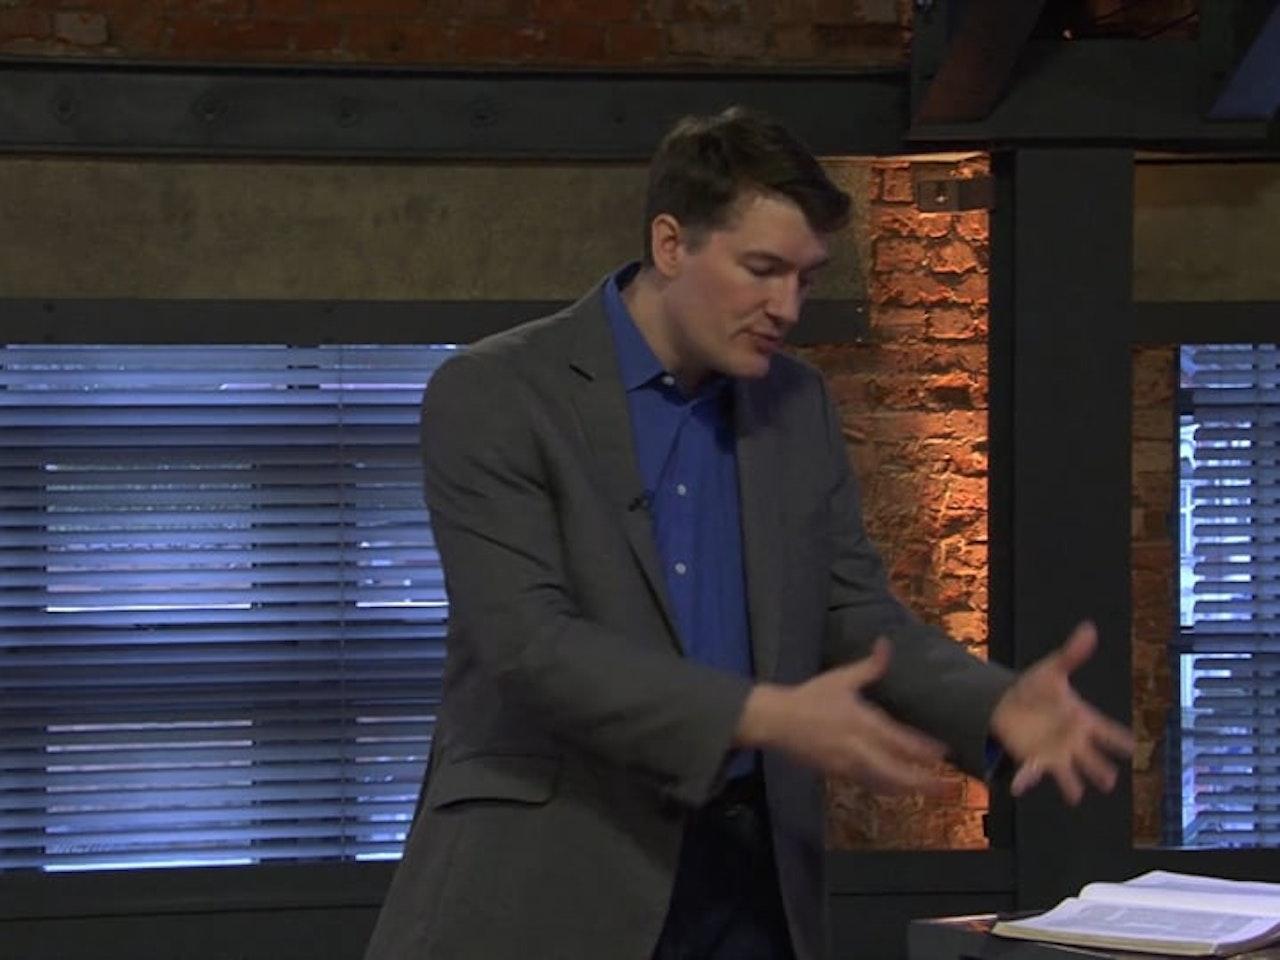 Seeking the Presence of God - Ep 1 - Needing God